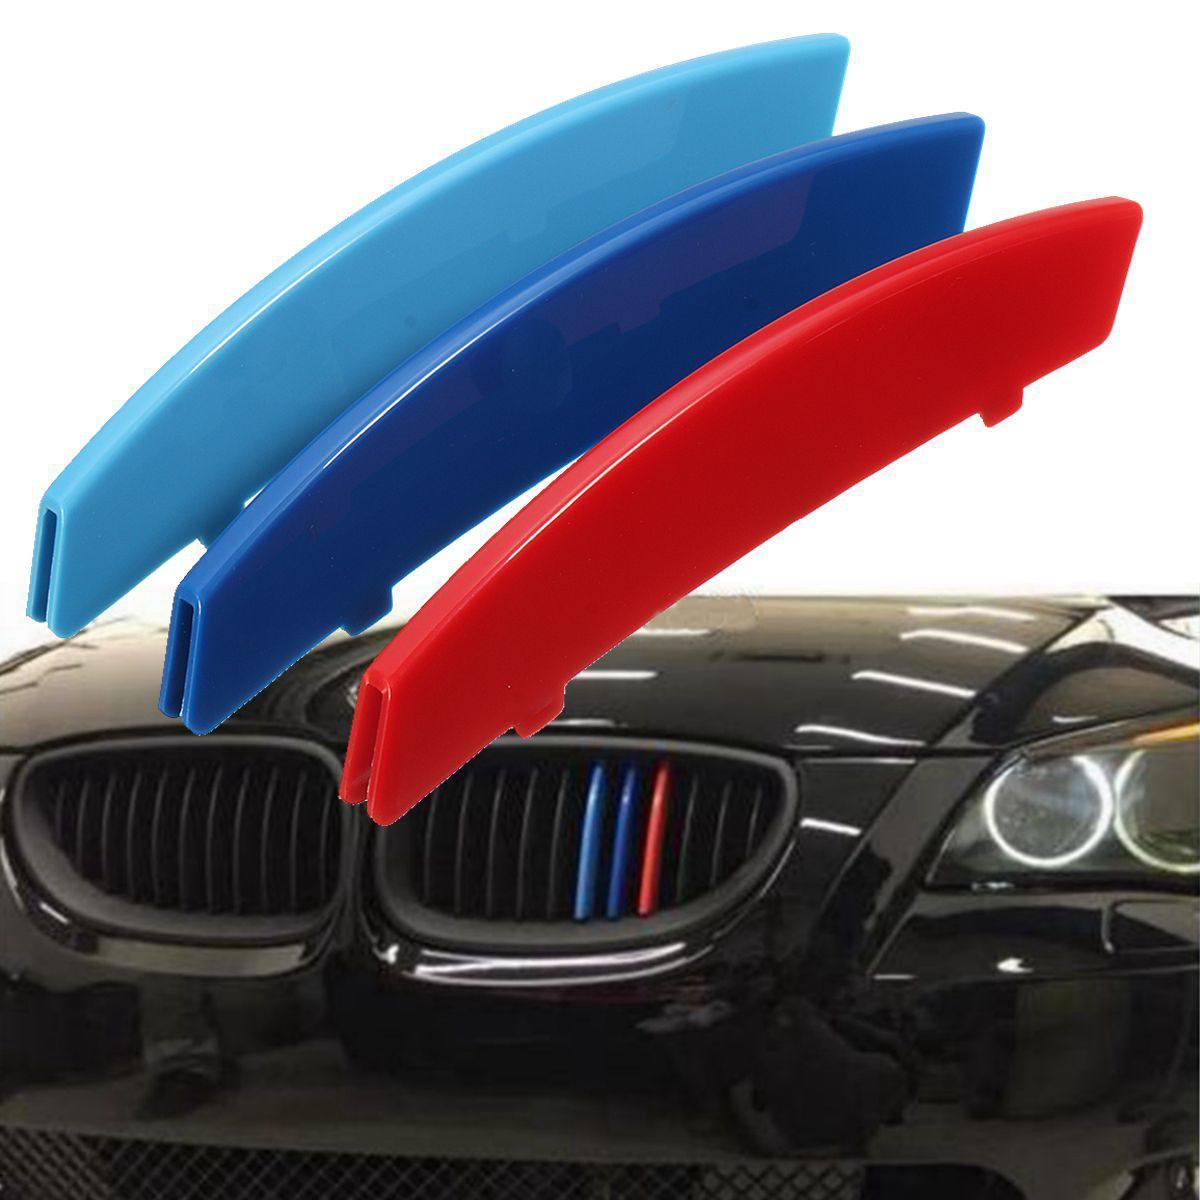 3pcs 3D 레이싱 스포츠 스트라이프 클립 ABS 스티커 BMW 3 시리즈 F30 F31 F35 E90 5 시리즈 F10 F18 E60 X5 X6 E70